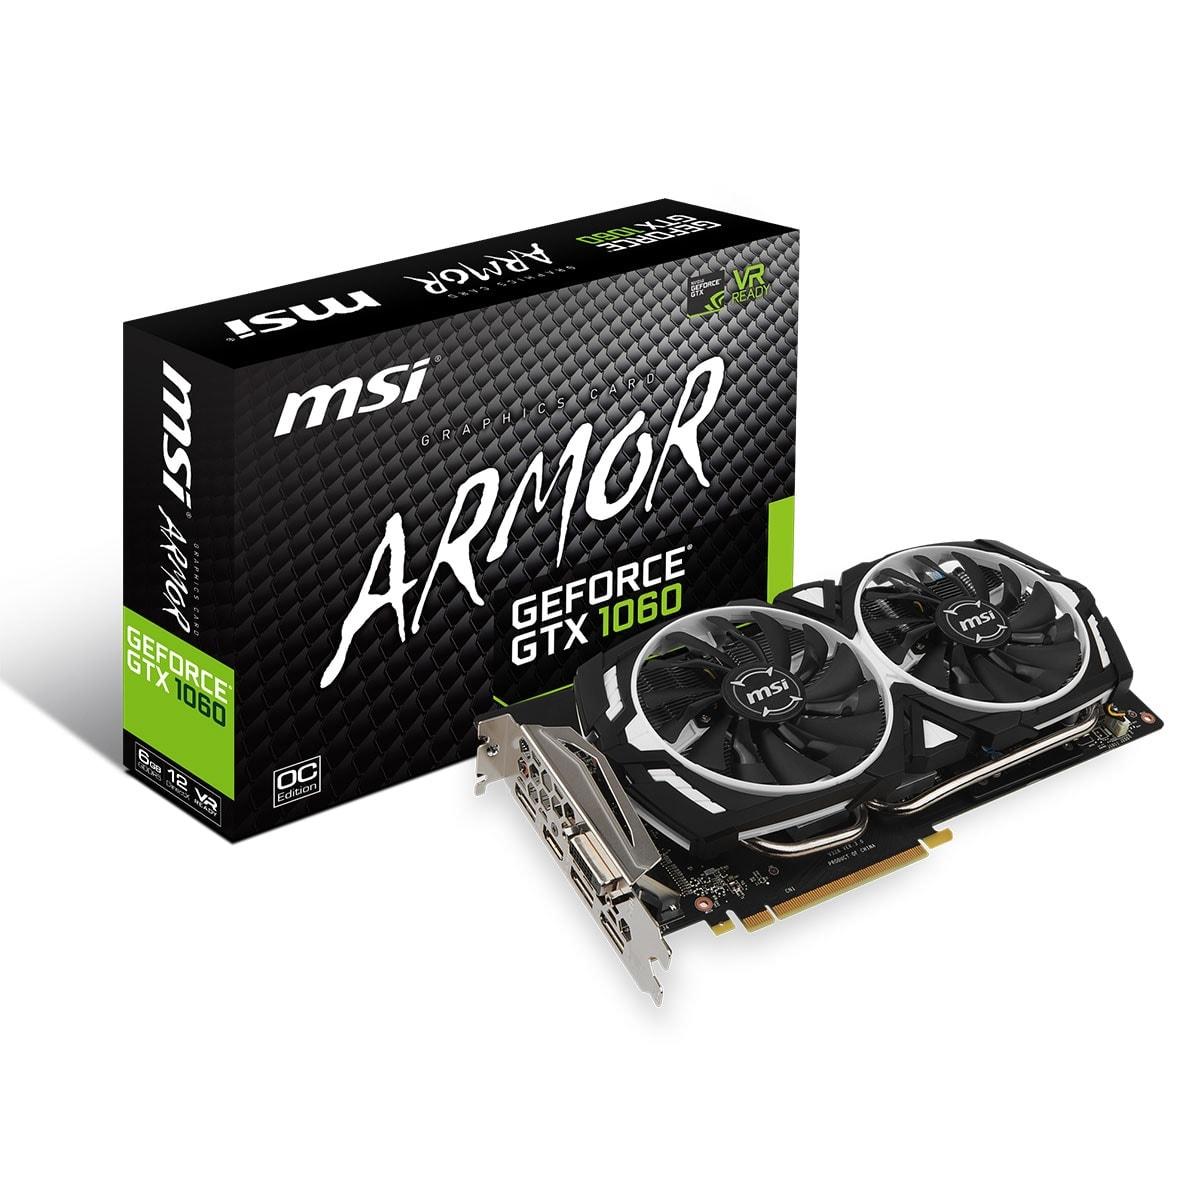 MSI GeForce GTX 1060 ARMOR 6G OCV1  (912-V328-028) - Achat / Vente Carte Graphique sur Cybertek.fr - 0